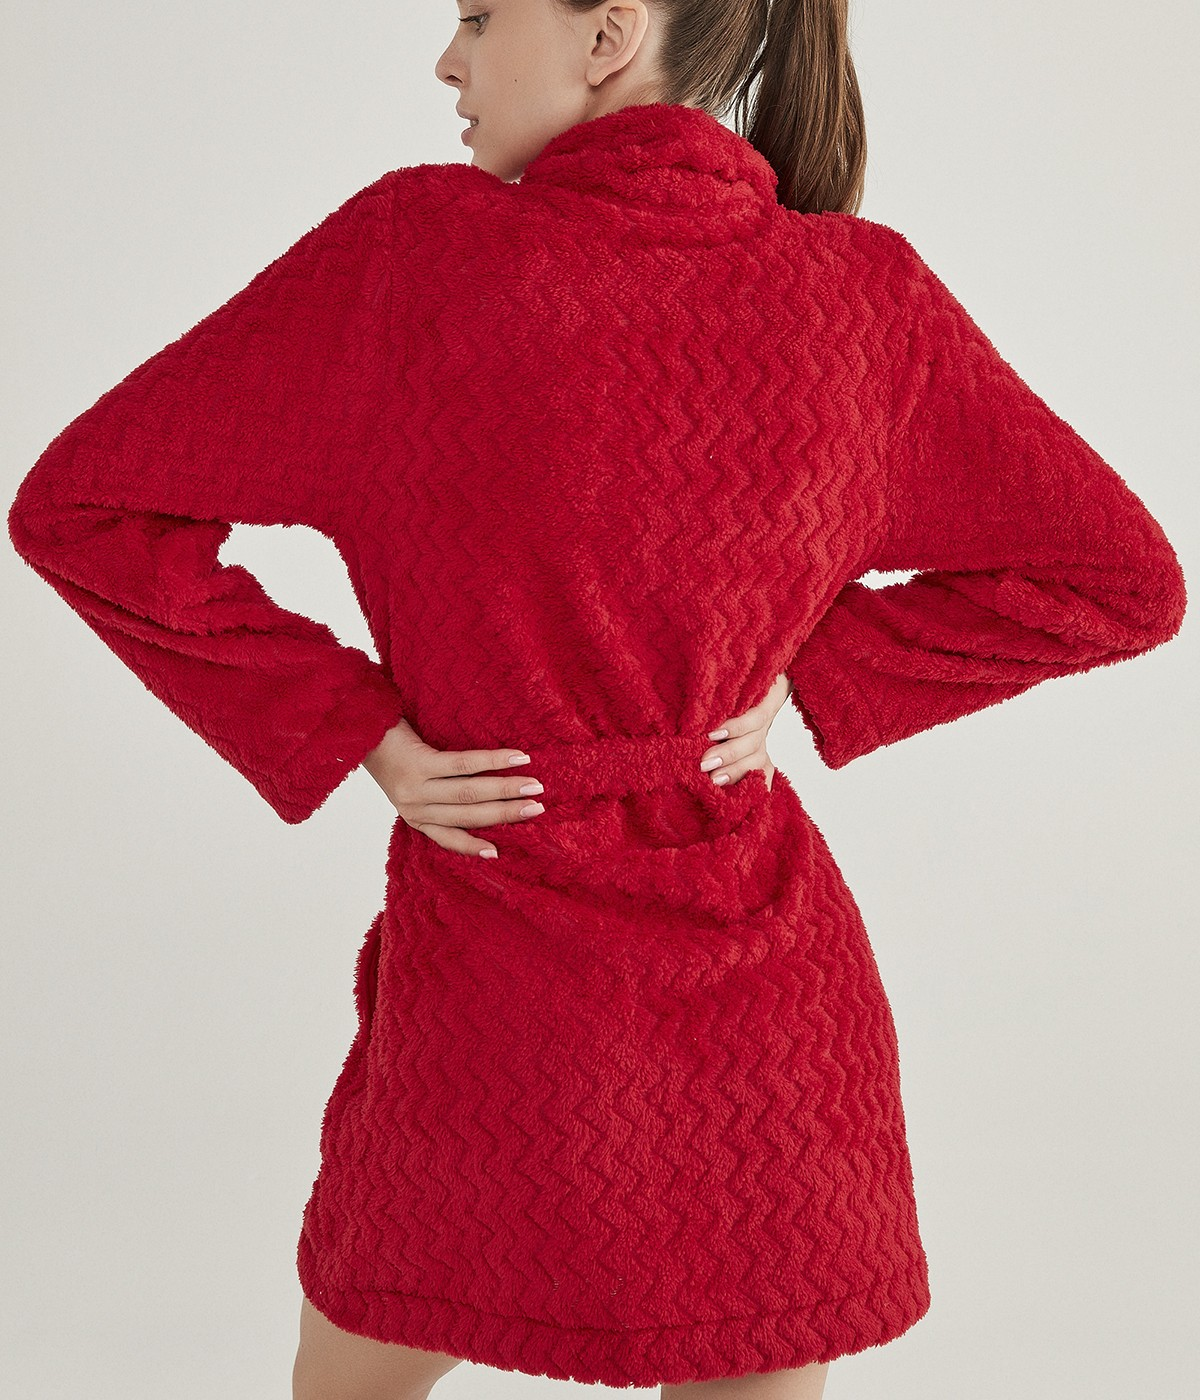 Halate Soft Red